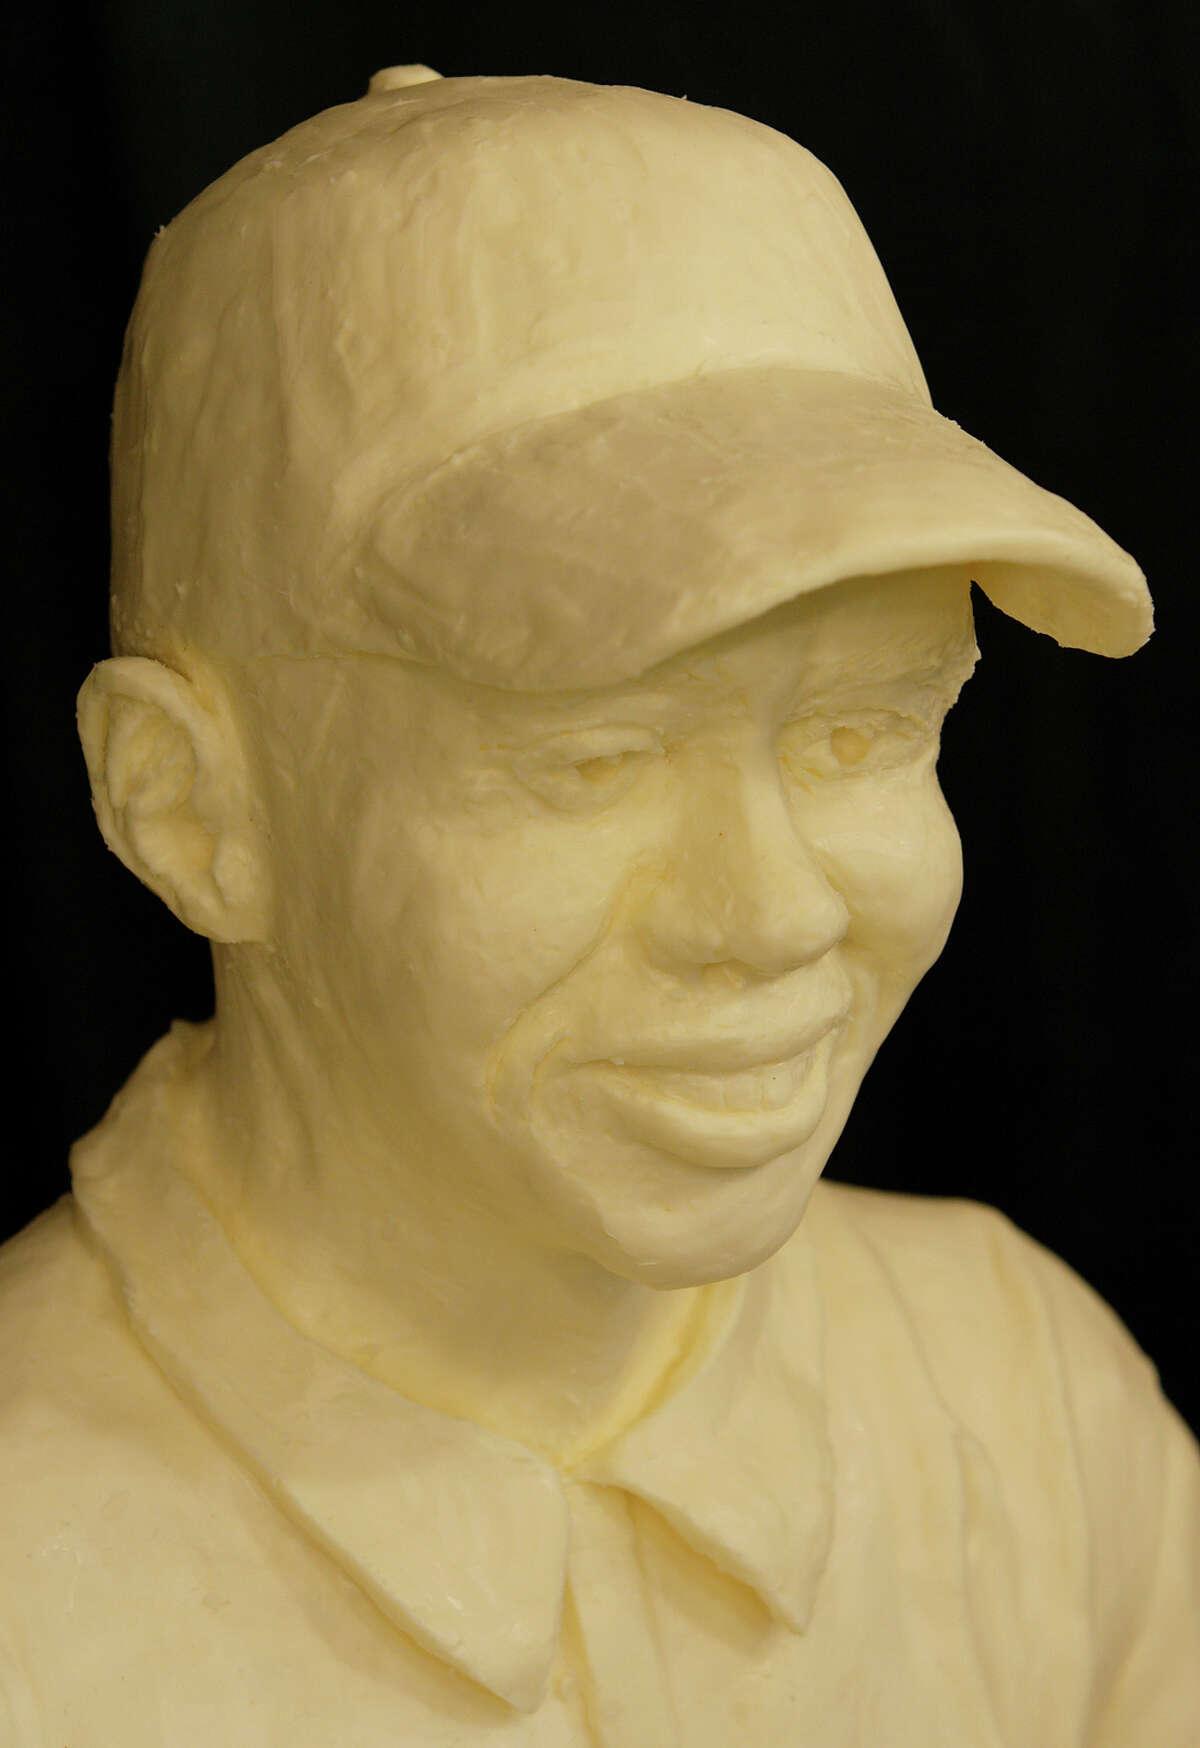 2005: Butter Tiger Woods